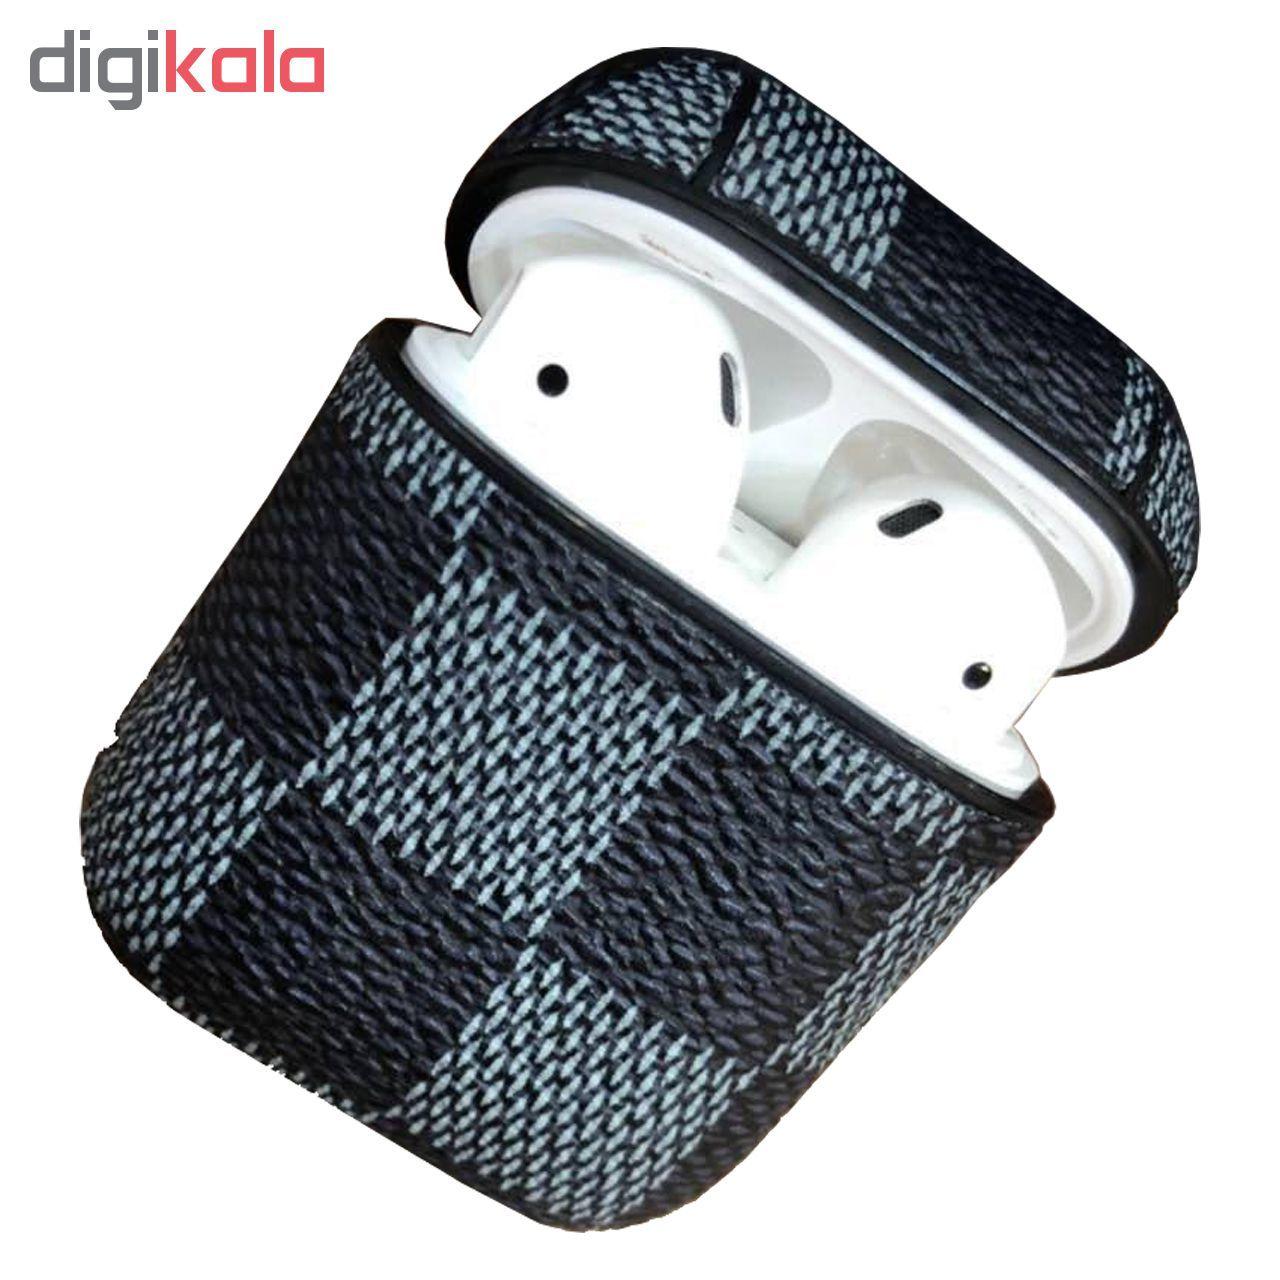 کاور محافظ  مدل Leather مناسب برای کیس هدفون اپل AirPods main 1 1